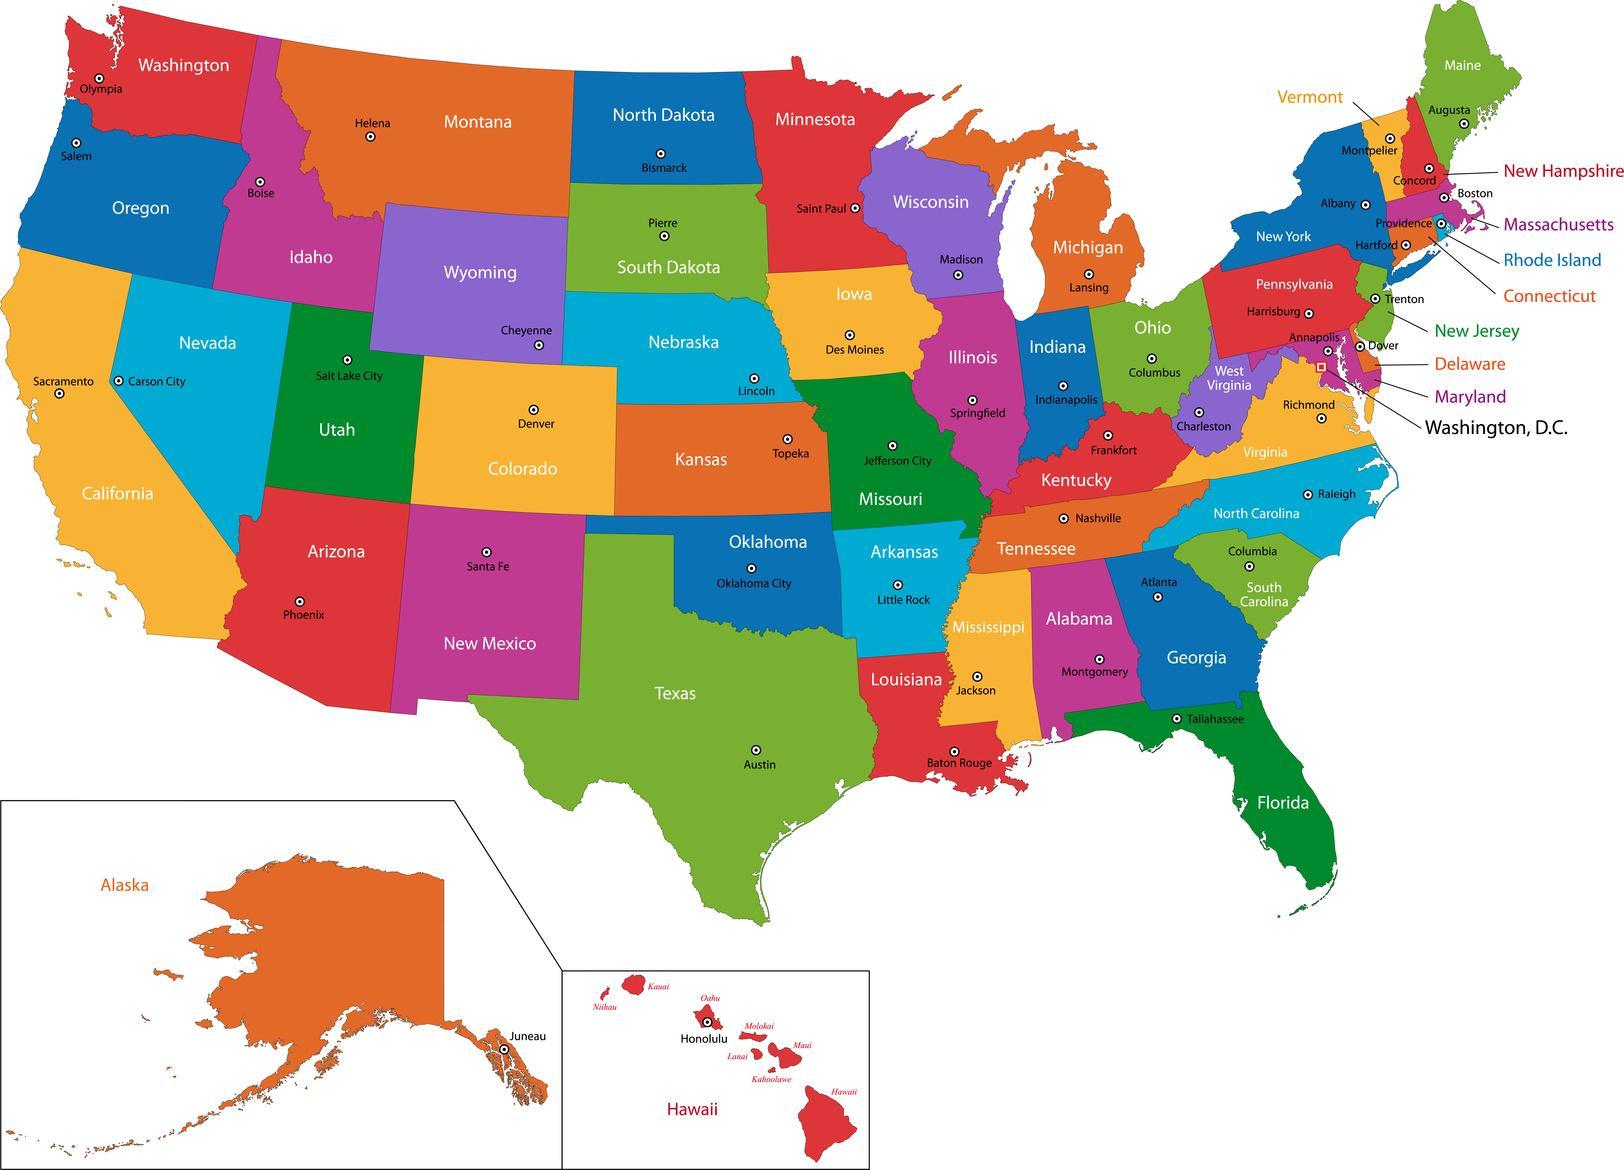 kart over usa med stater Usa kartet med Stater og hovedsteder   Kart over Usa med store  kart over usa med stater